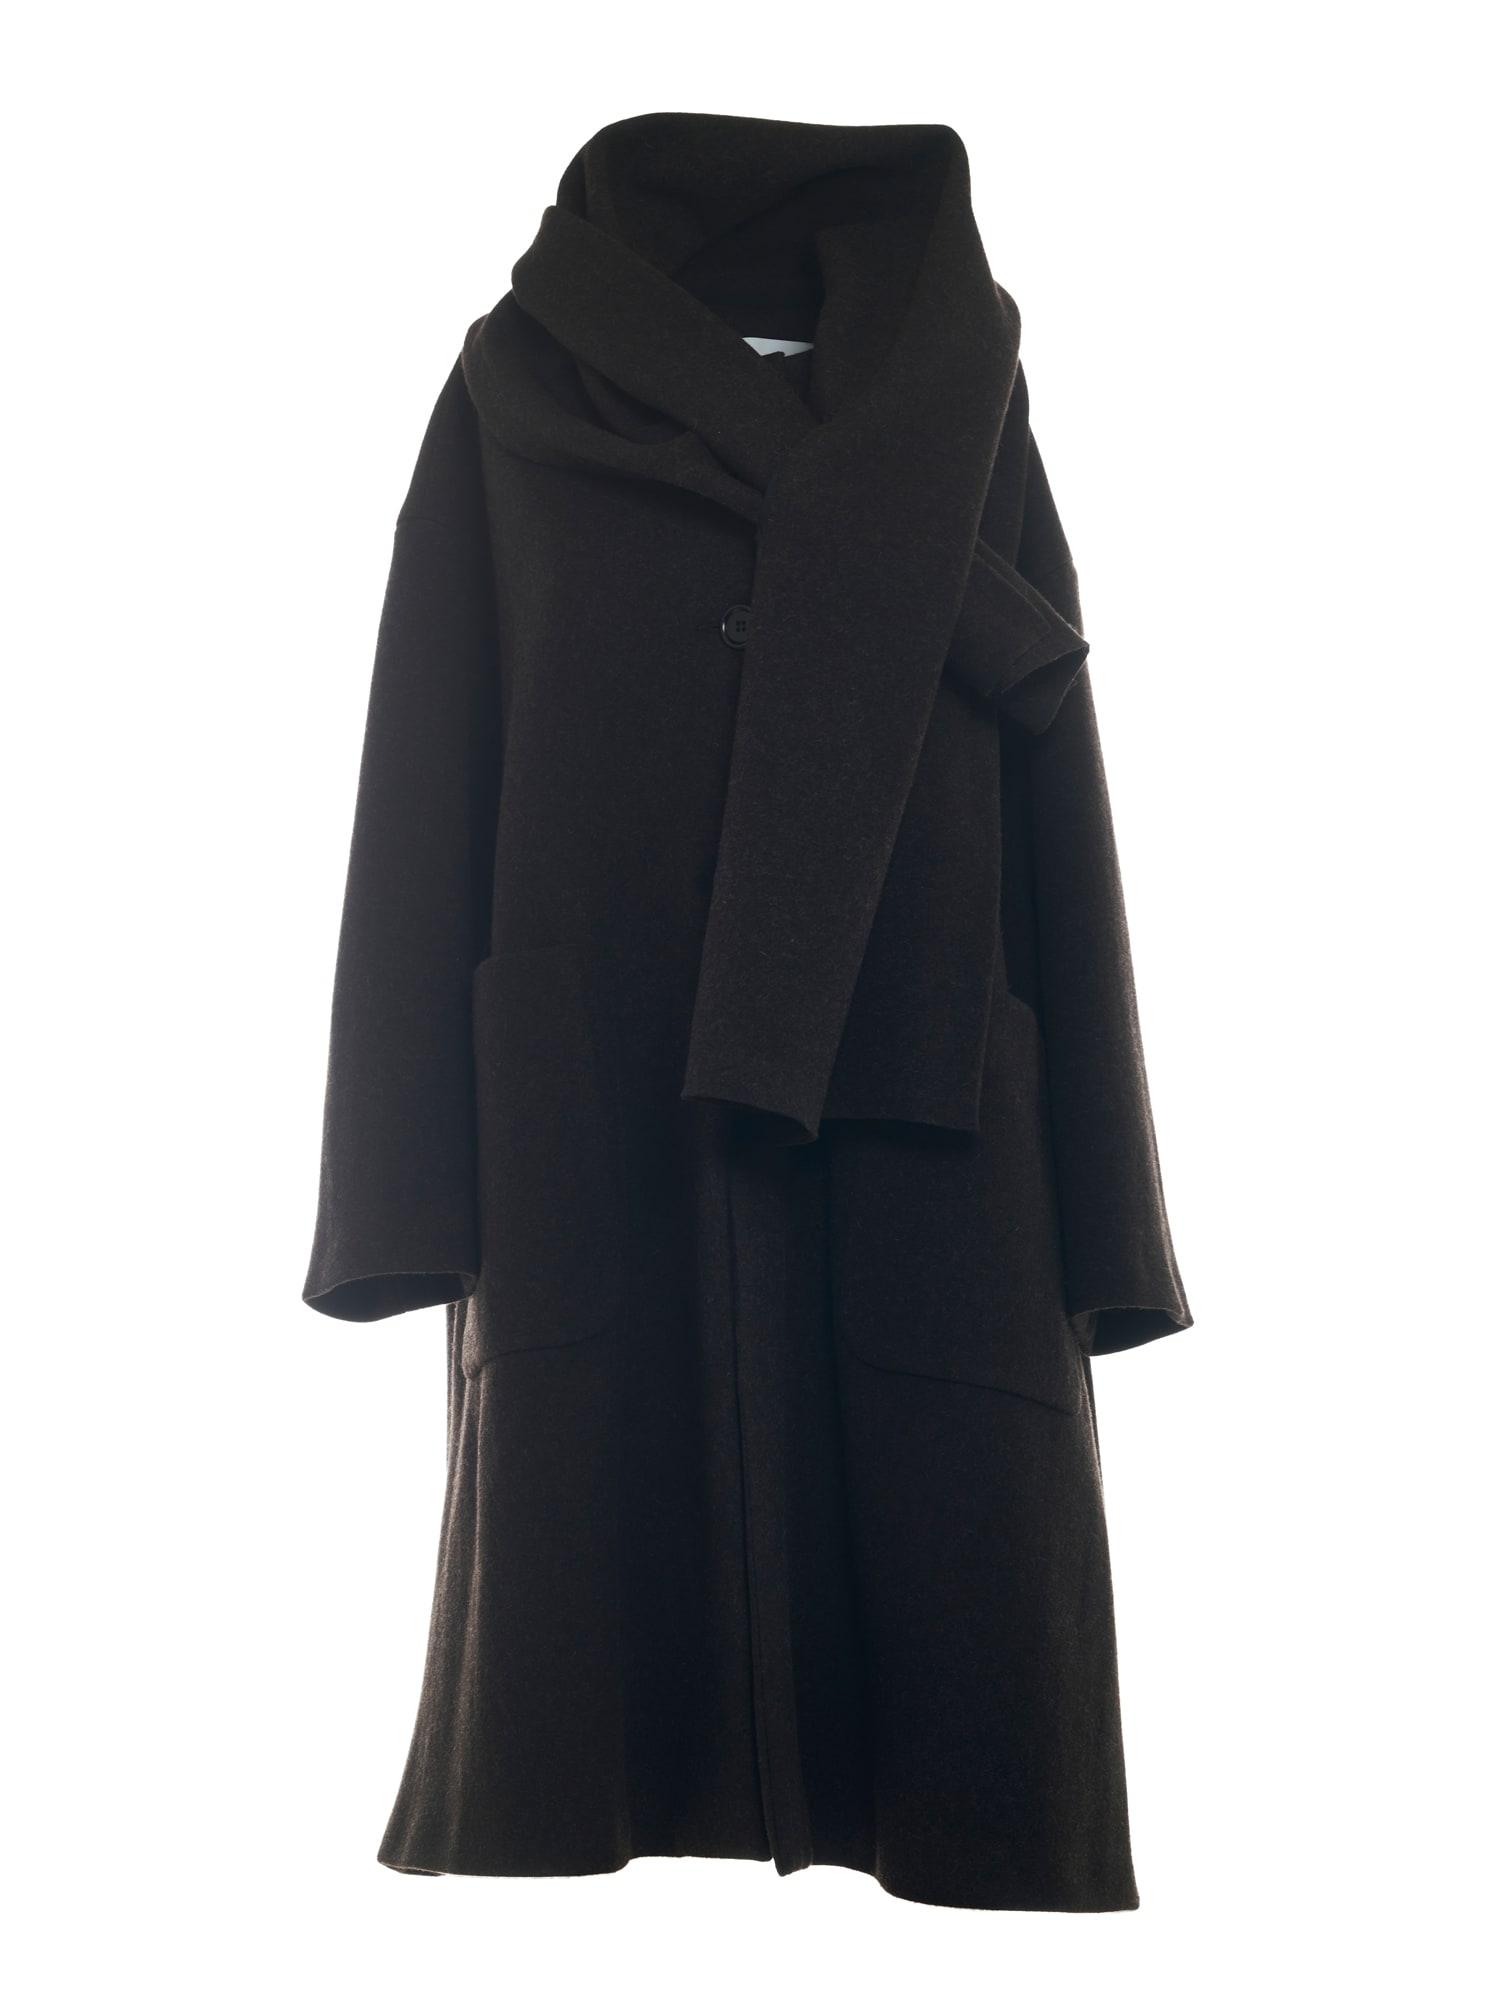 Bandana Coat